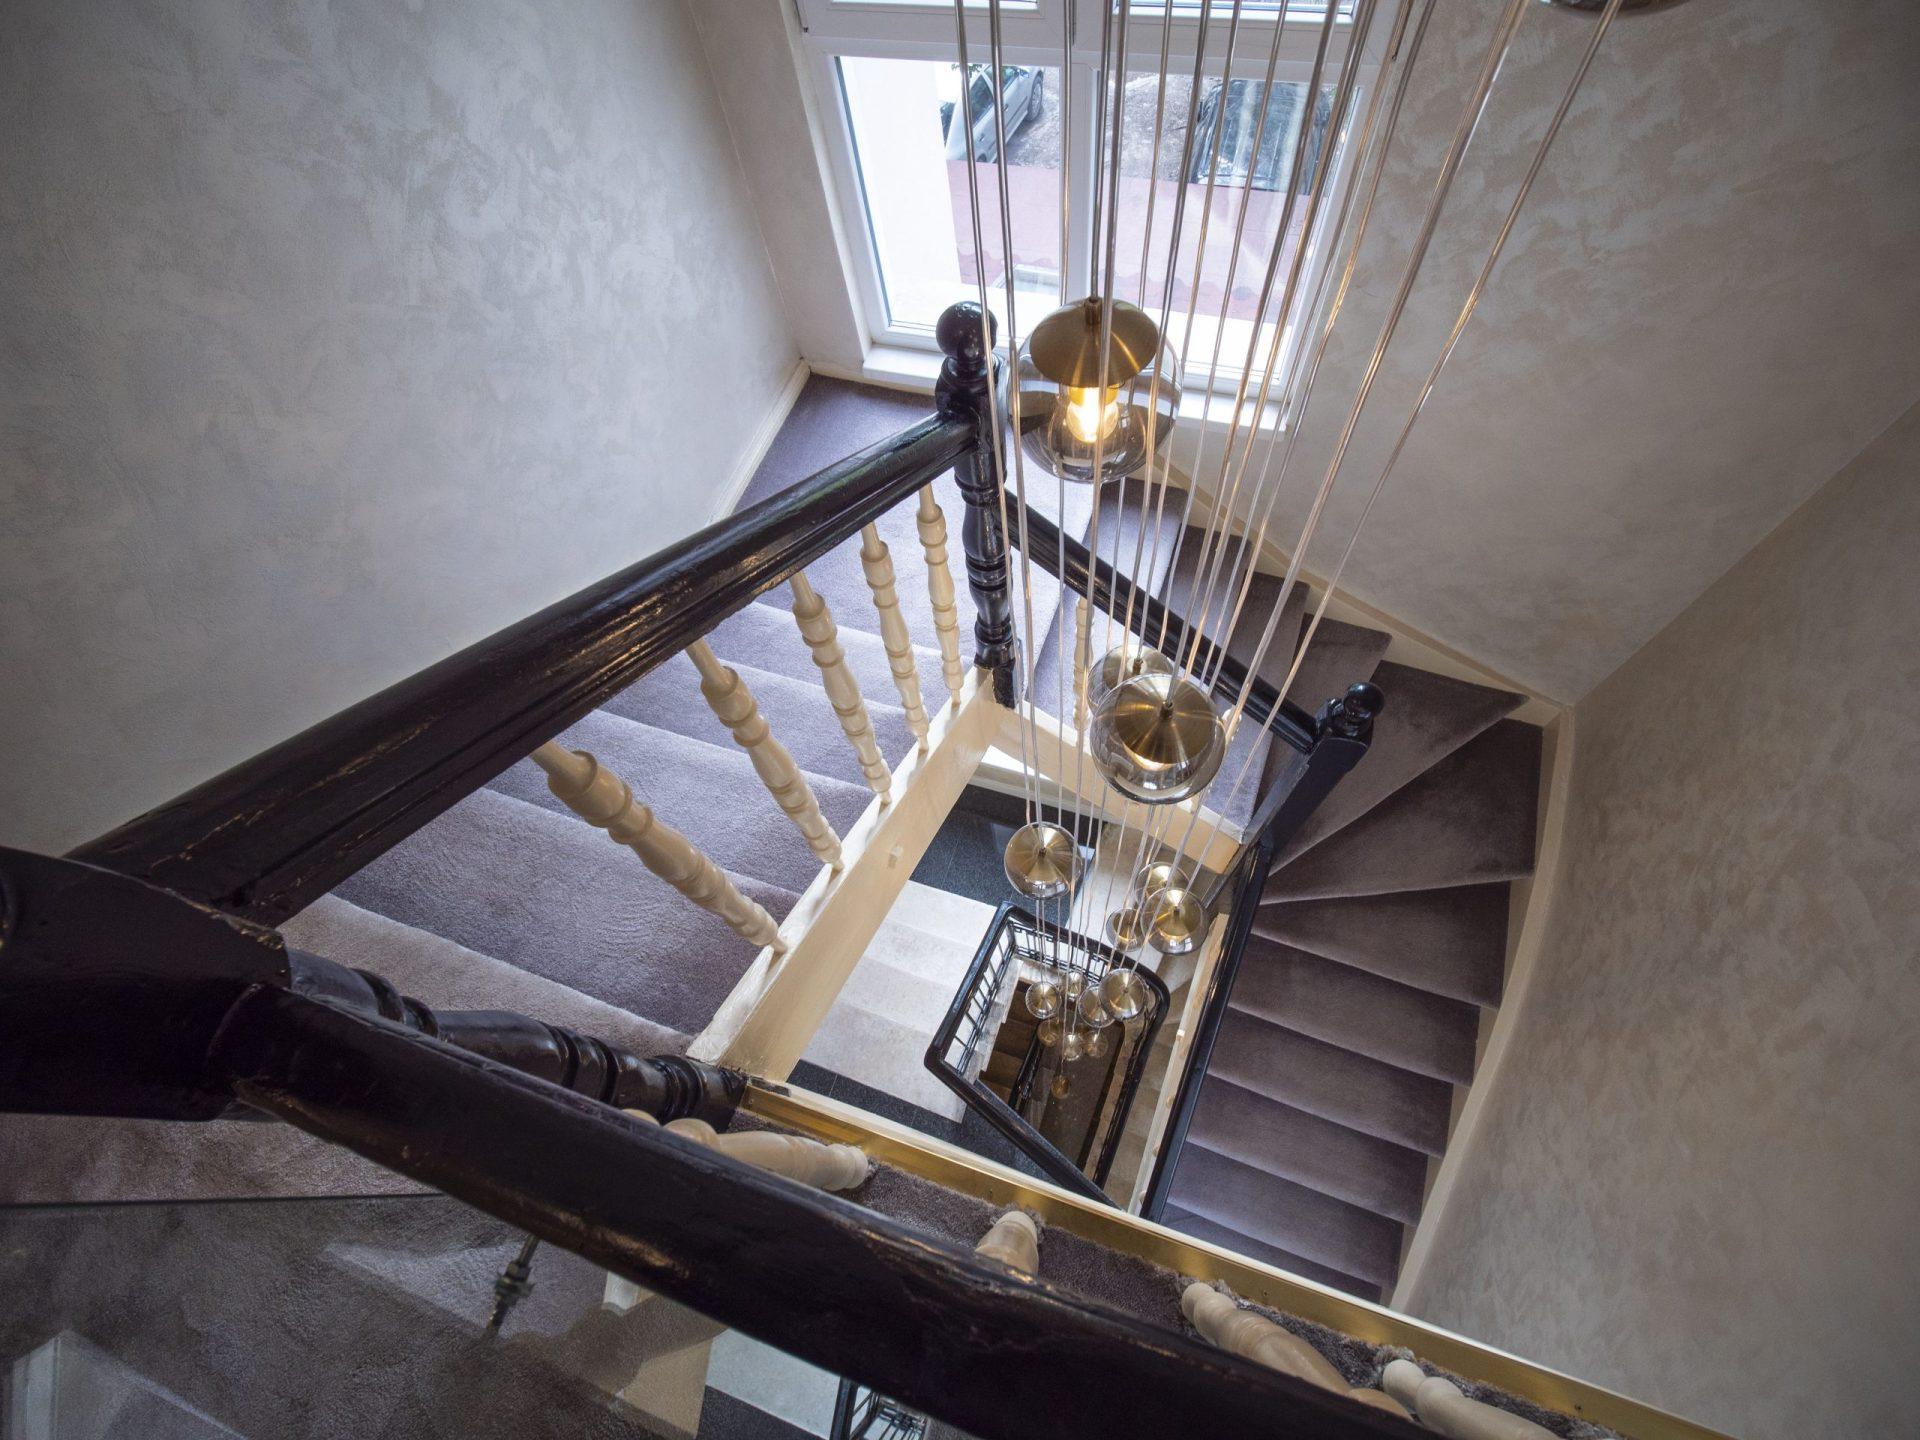 Stairway Lamps Top